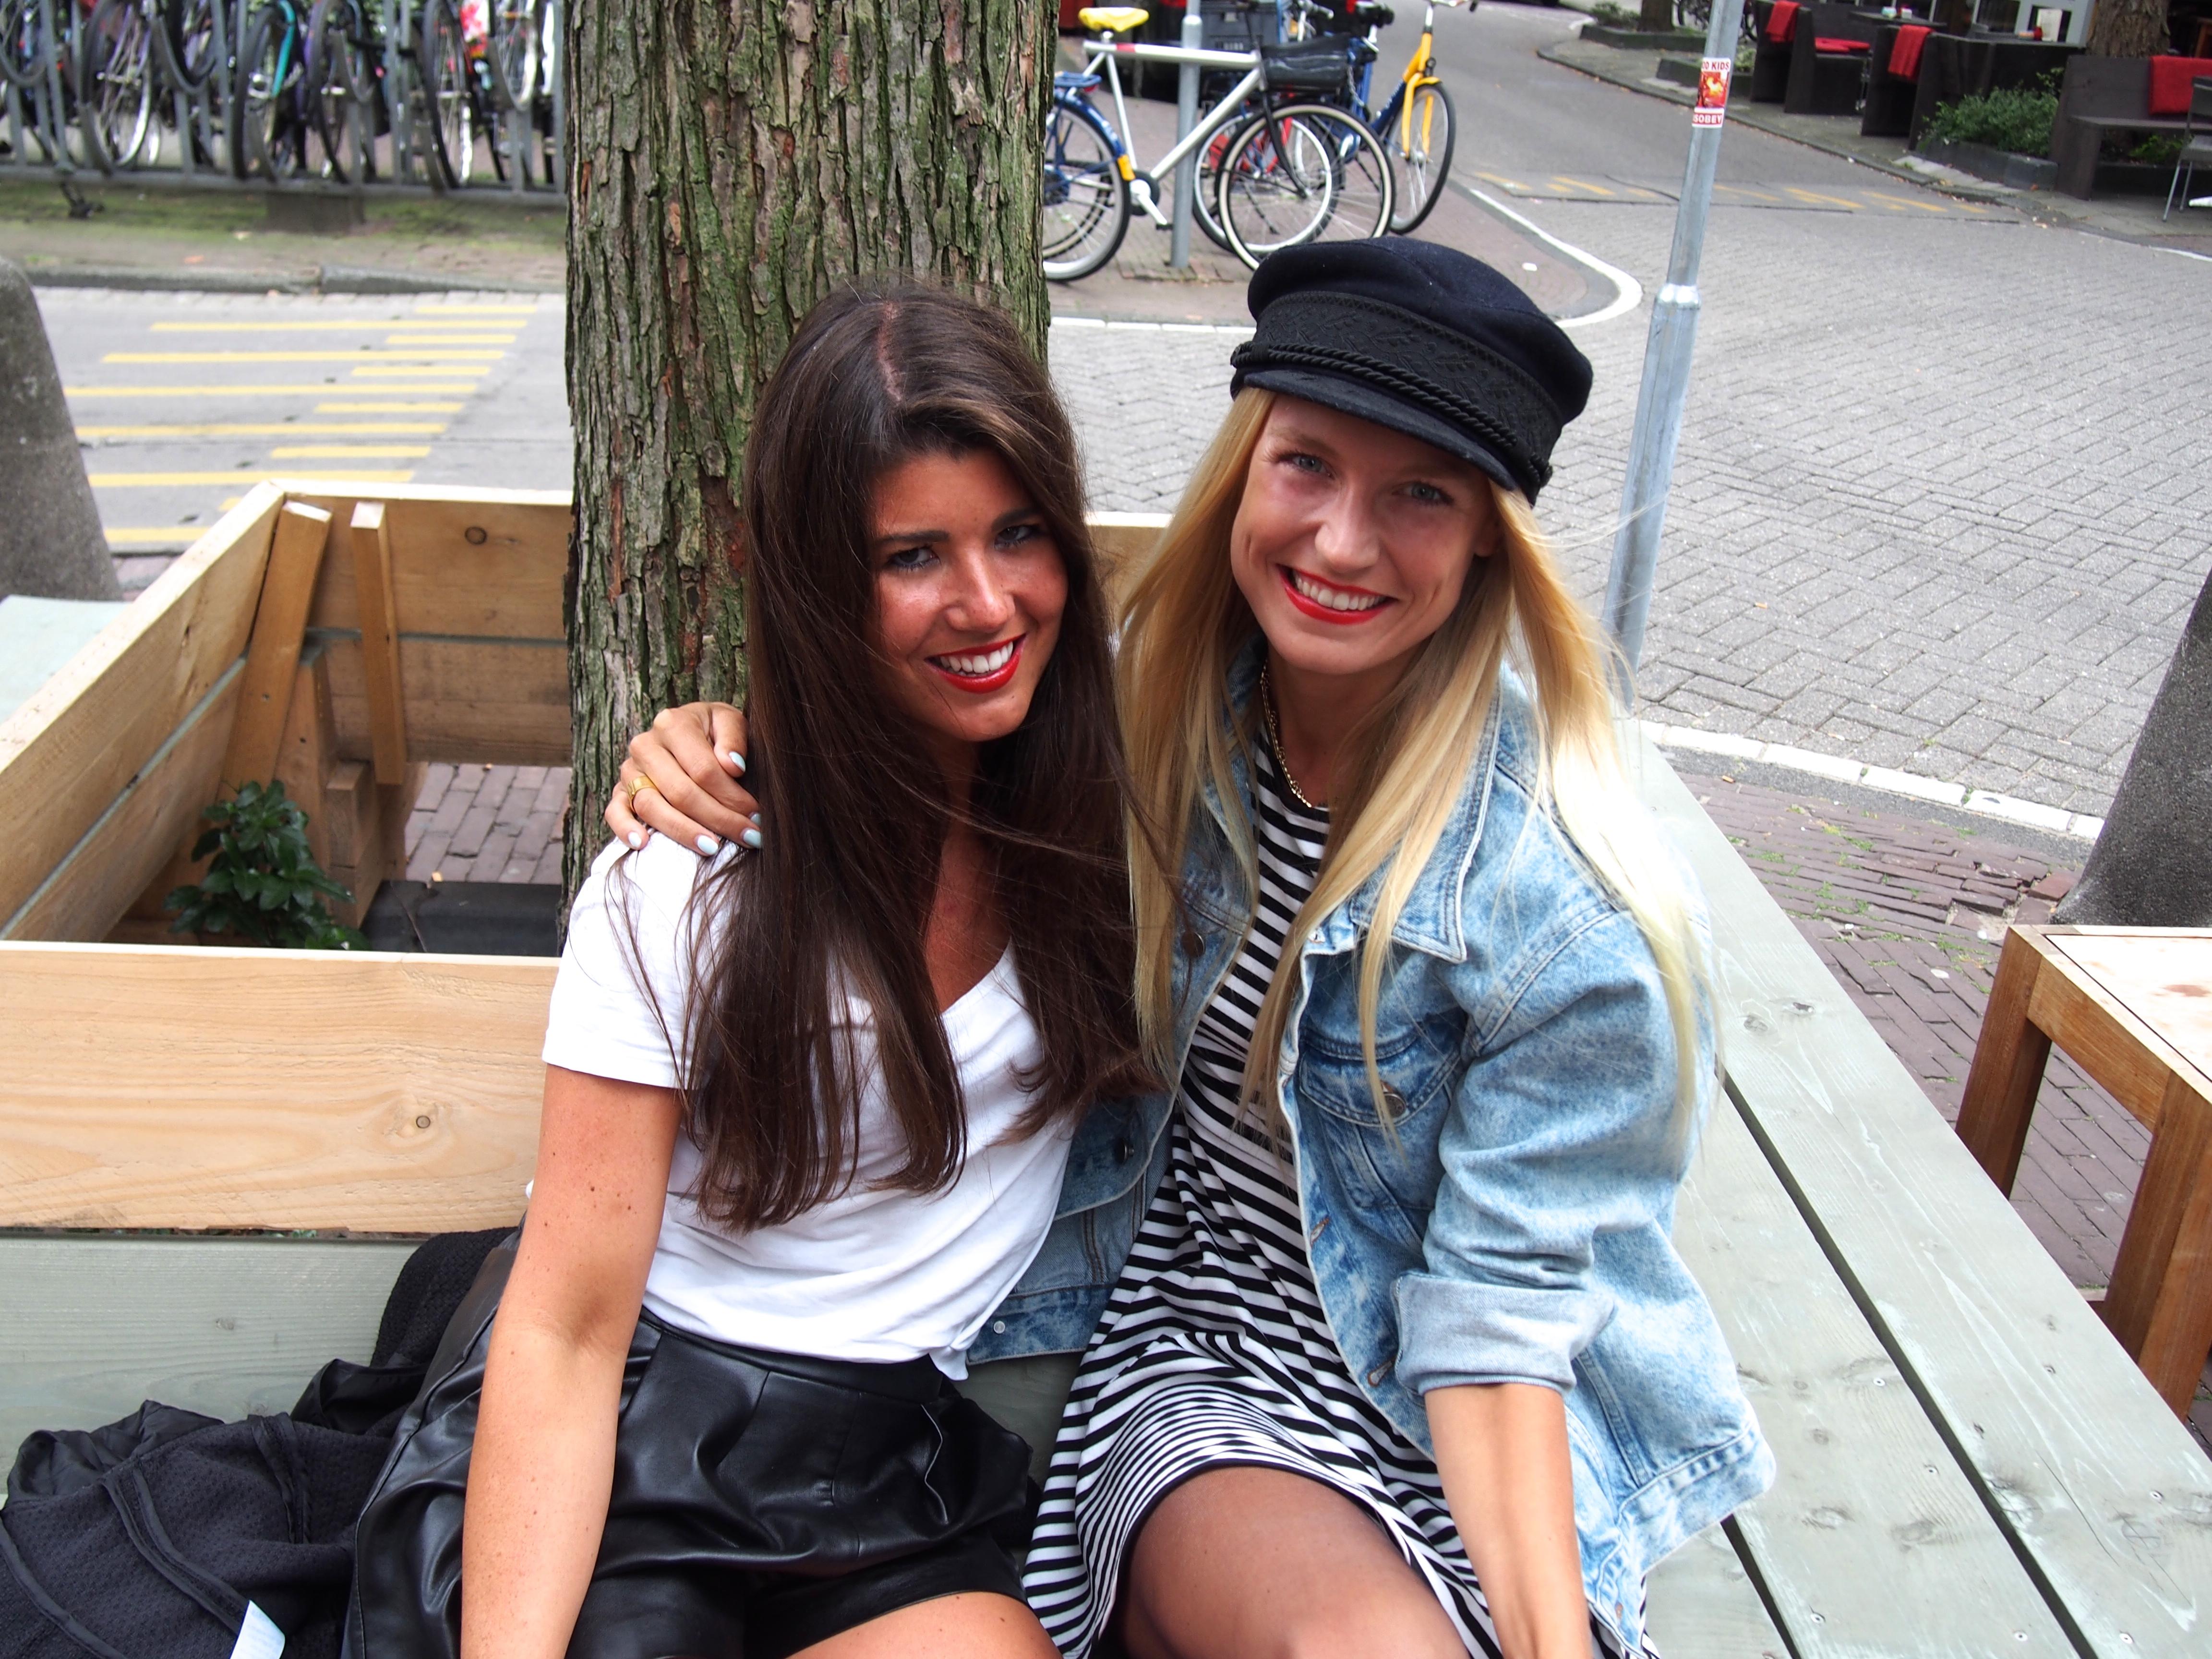 unna Haan en Chloe Sterk interview Kantor, Amsterdam Open Air en Valhalla bij Mem's Amsterdam